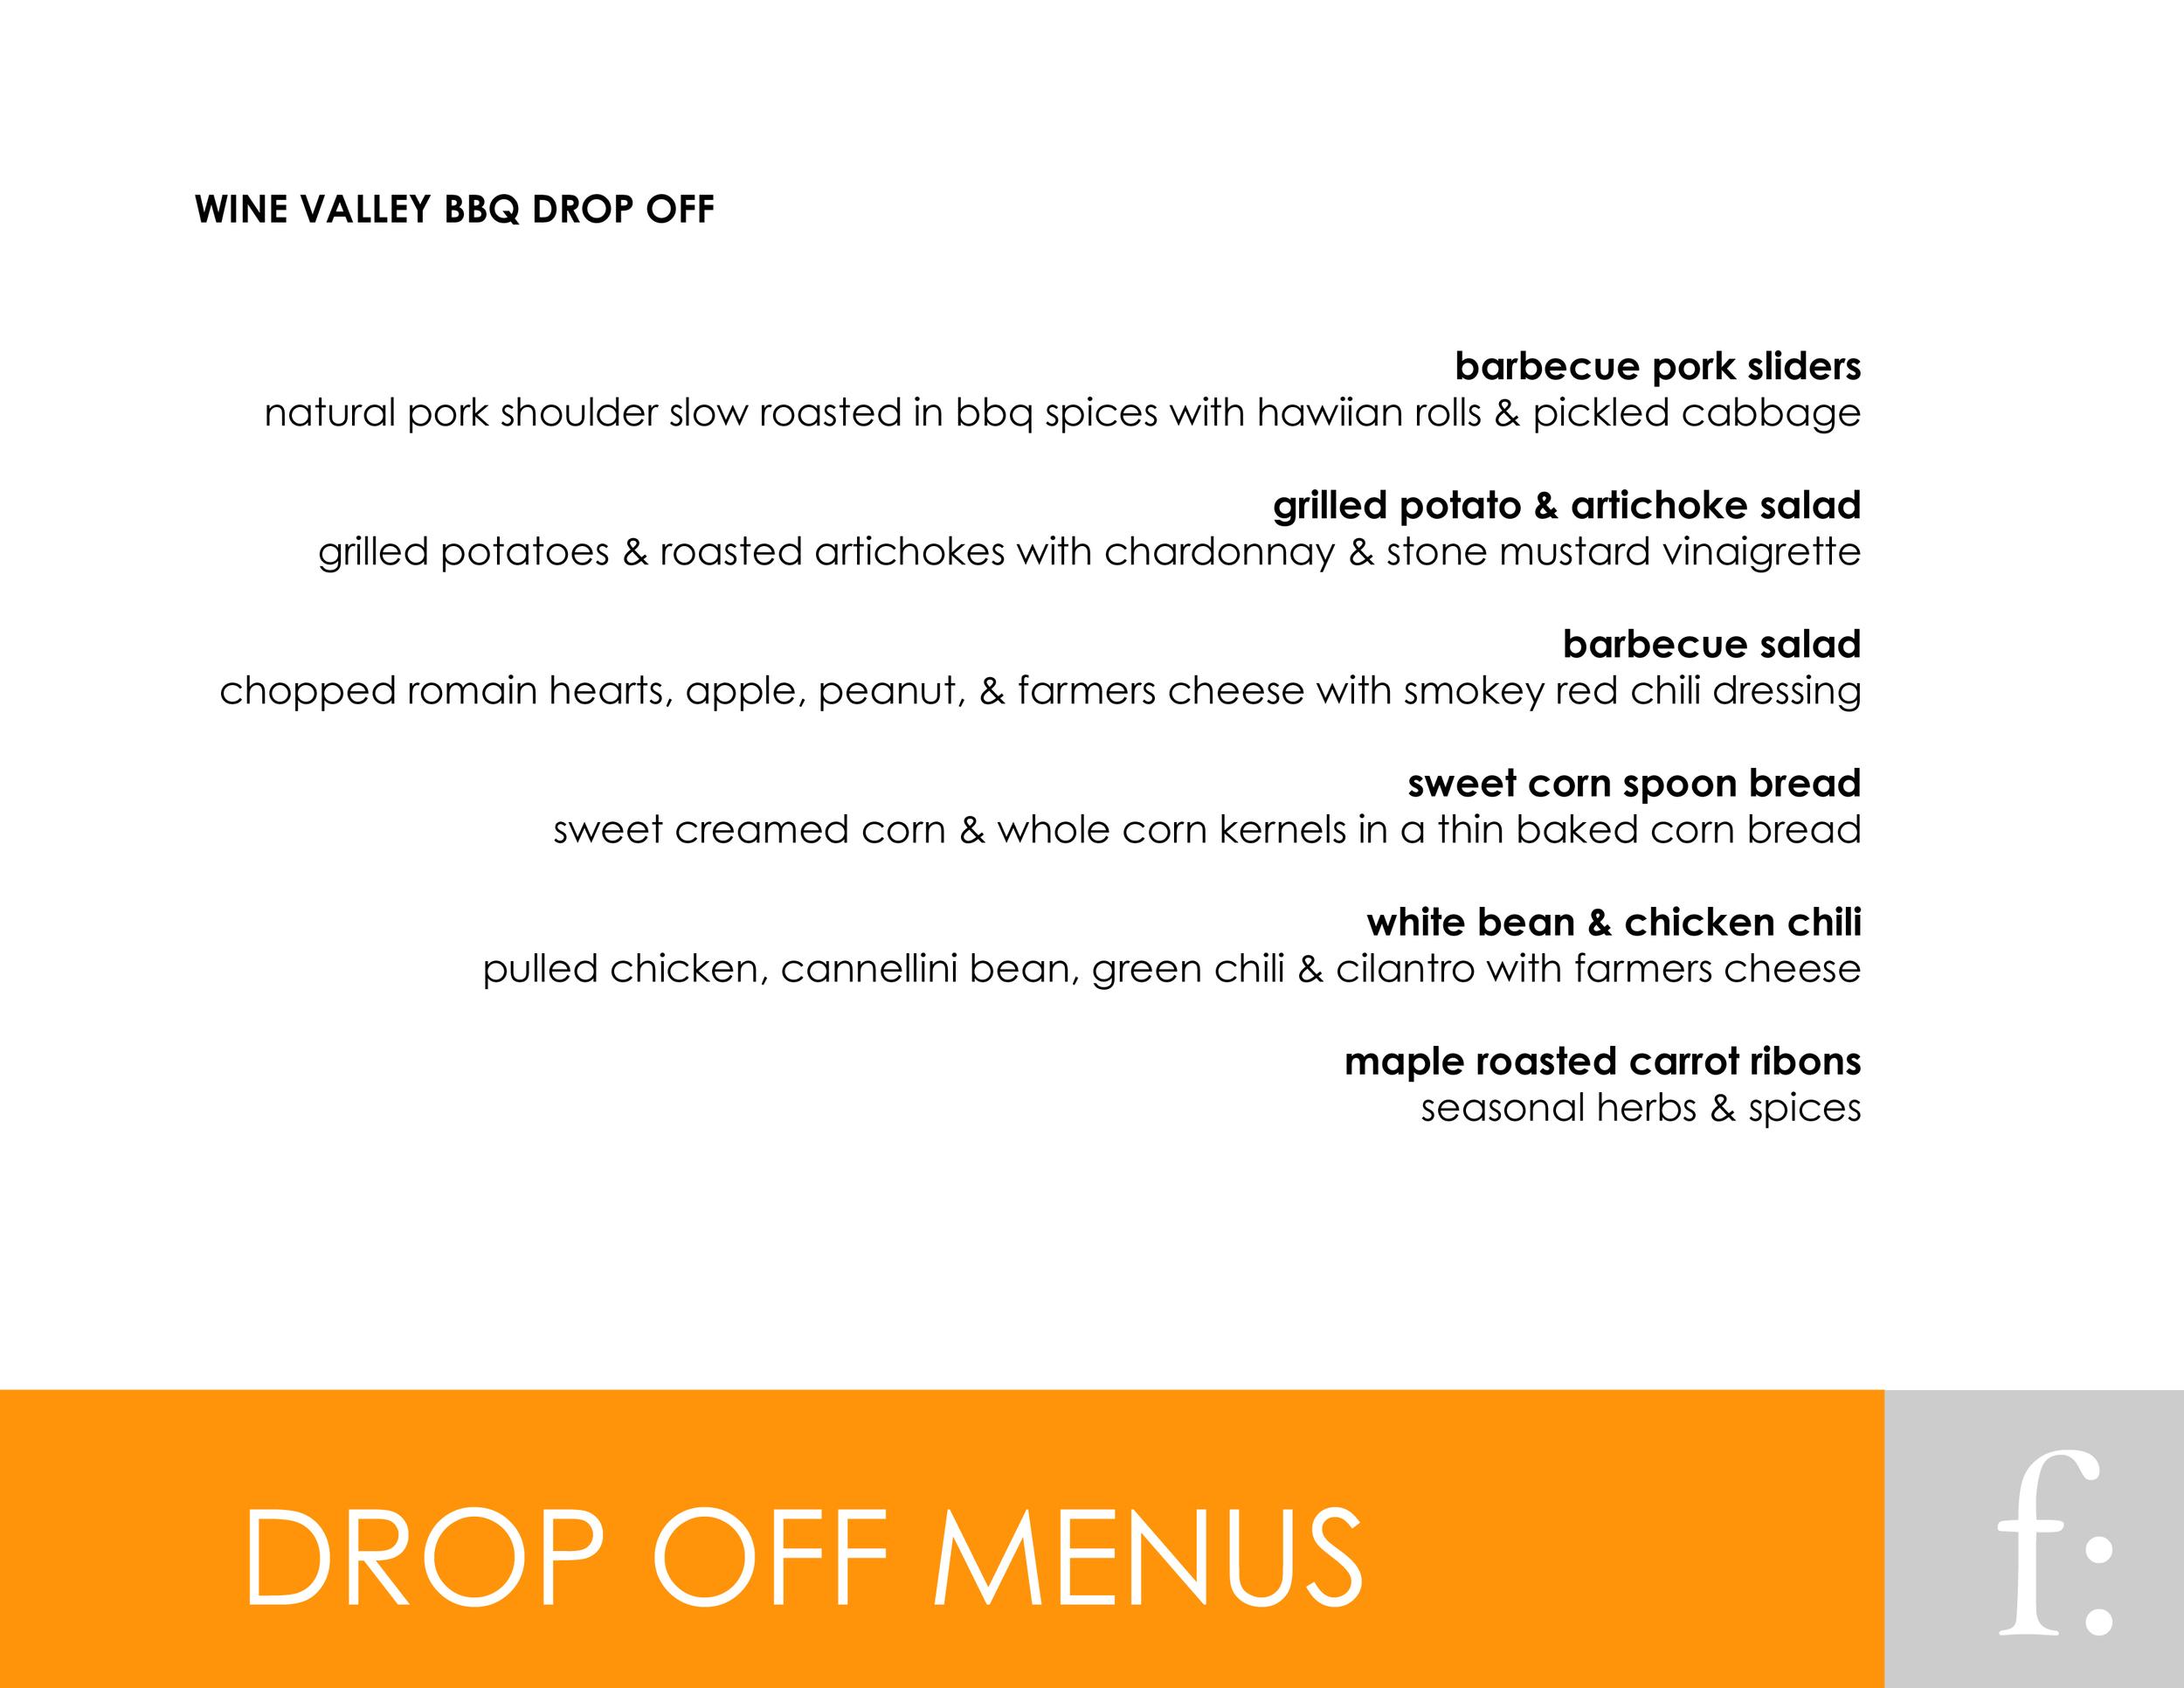 Drop off  3 wine valley bbq menu .jpg